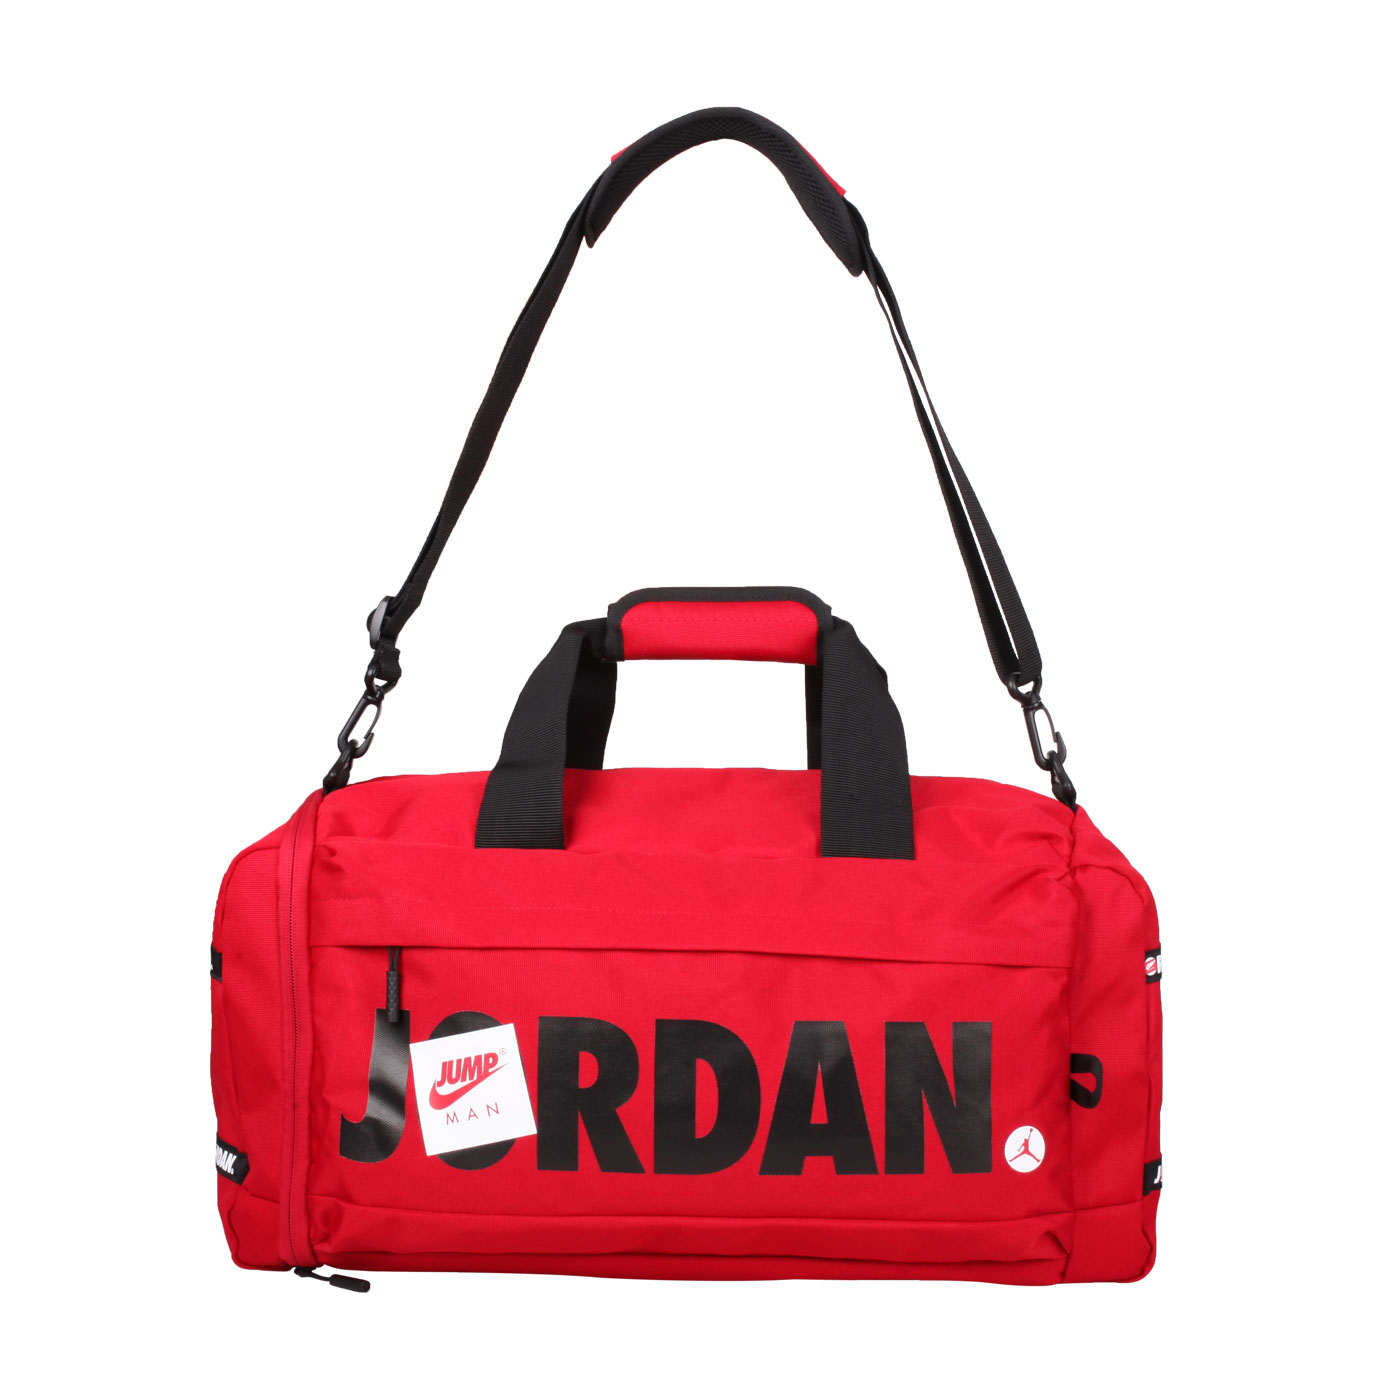 NIKE JORDAN 大型旅行袋 JD2113020AD-002